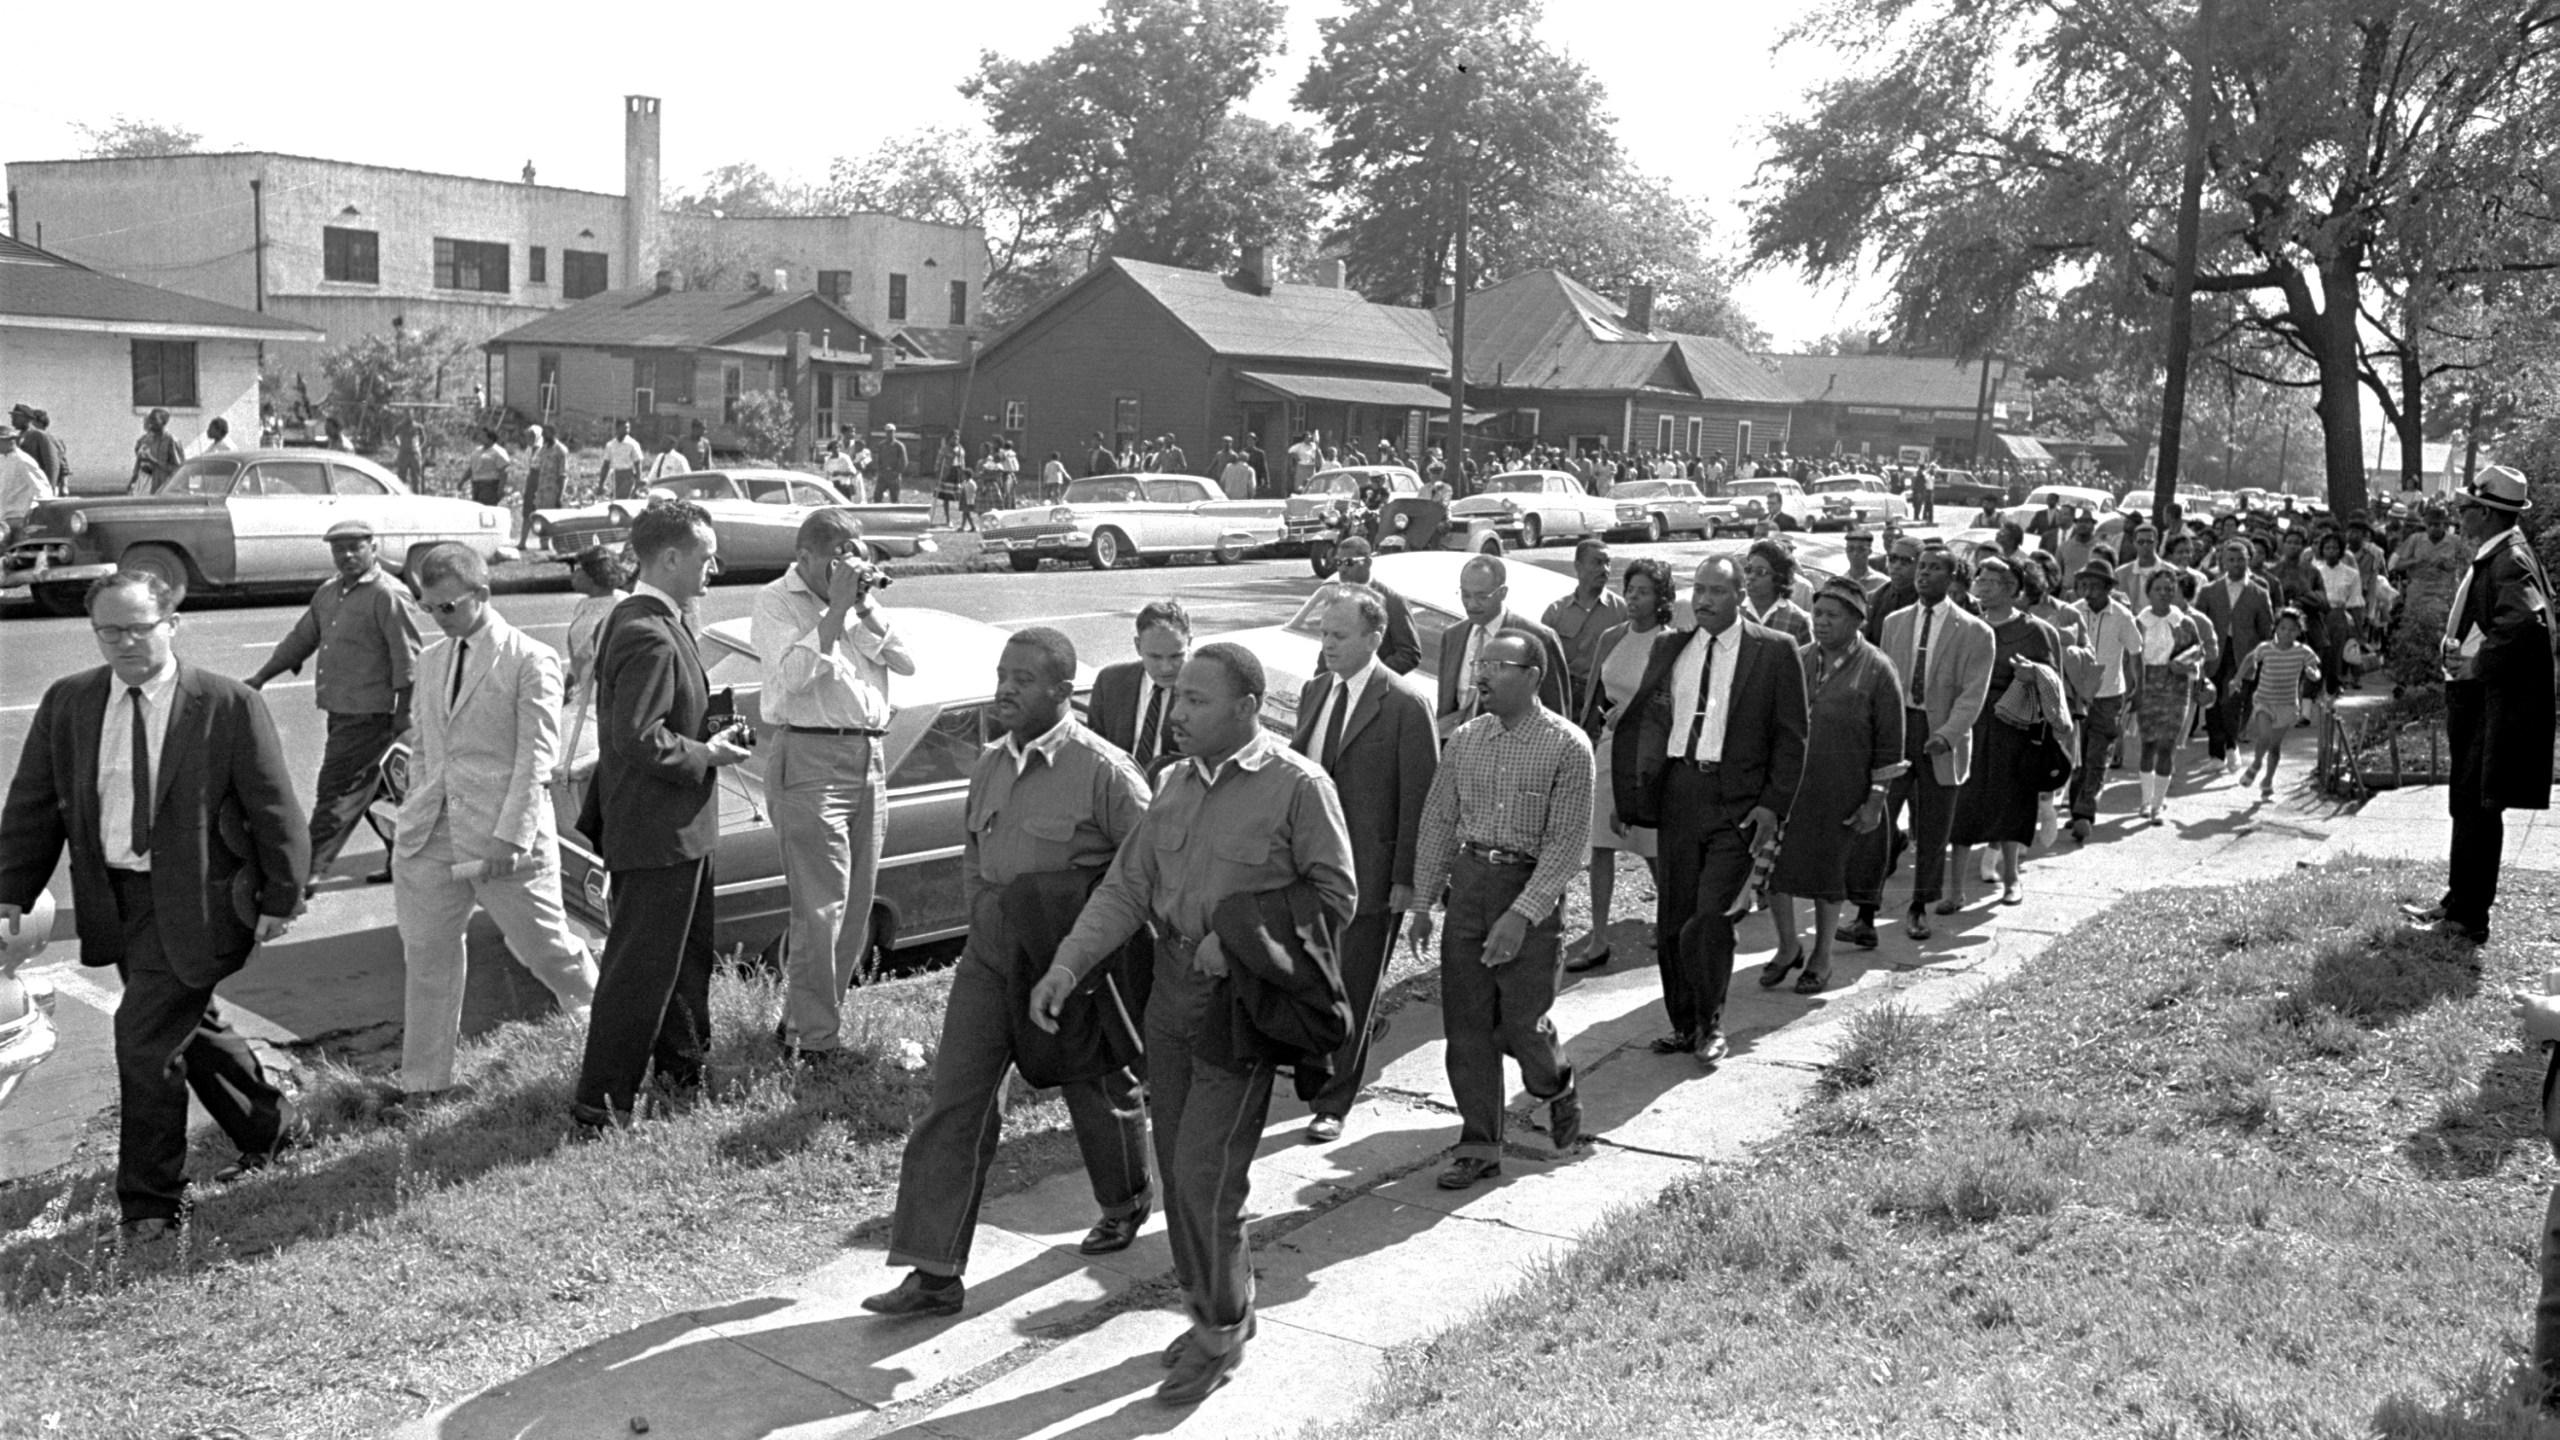 Martin Luther King Jr., Ralph David Abernathy, Birmingham march